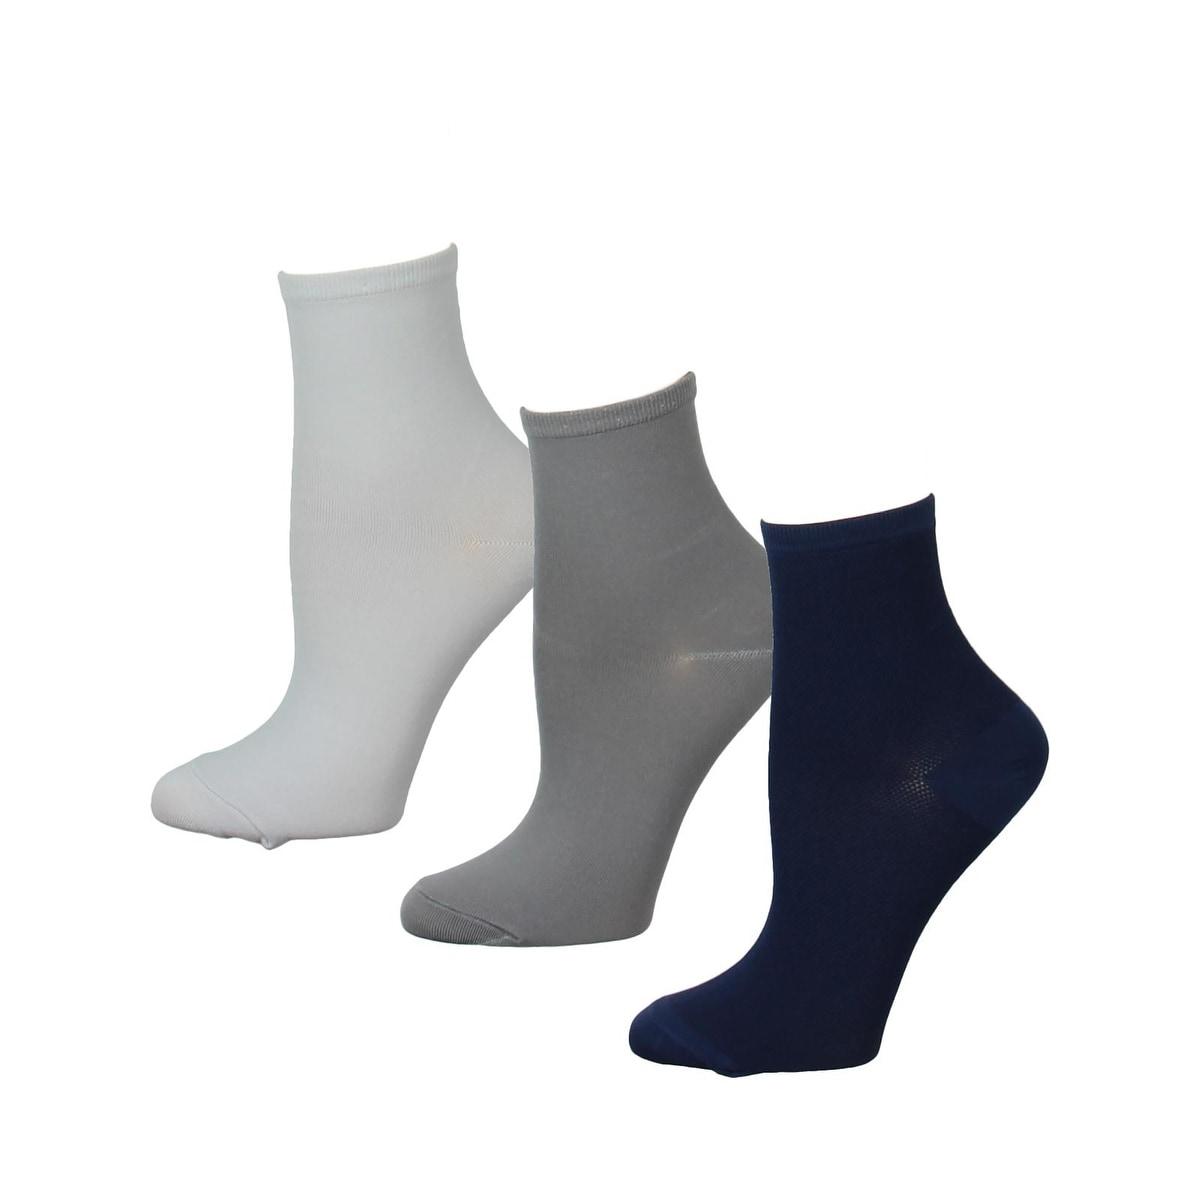 Halston Women/'s Low Cut Socks 6 Pr Lightweight Black//Grays Sock Size 9-11